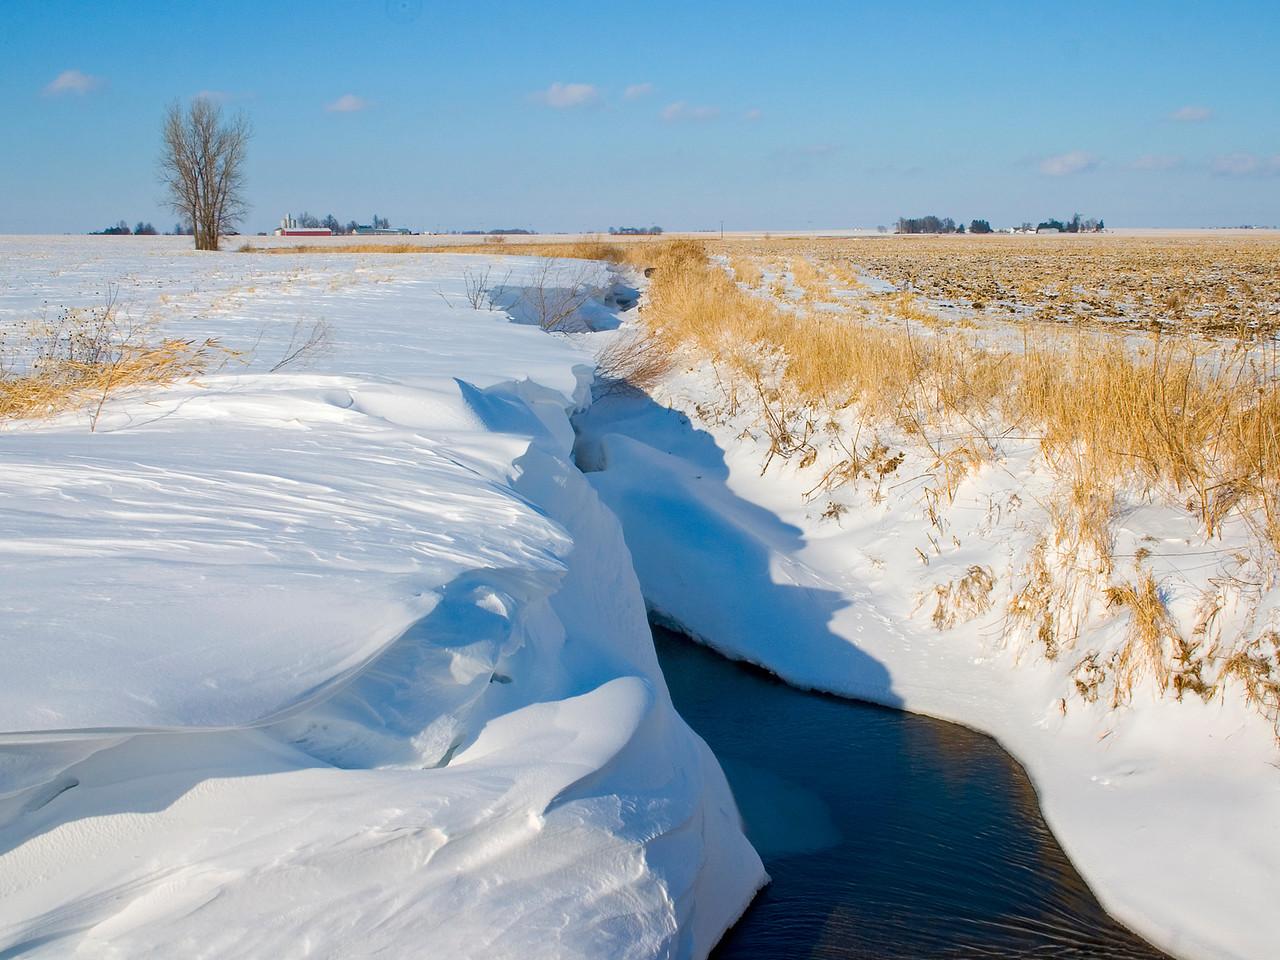 February 16 - Southern Macon County Illinois